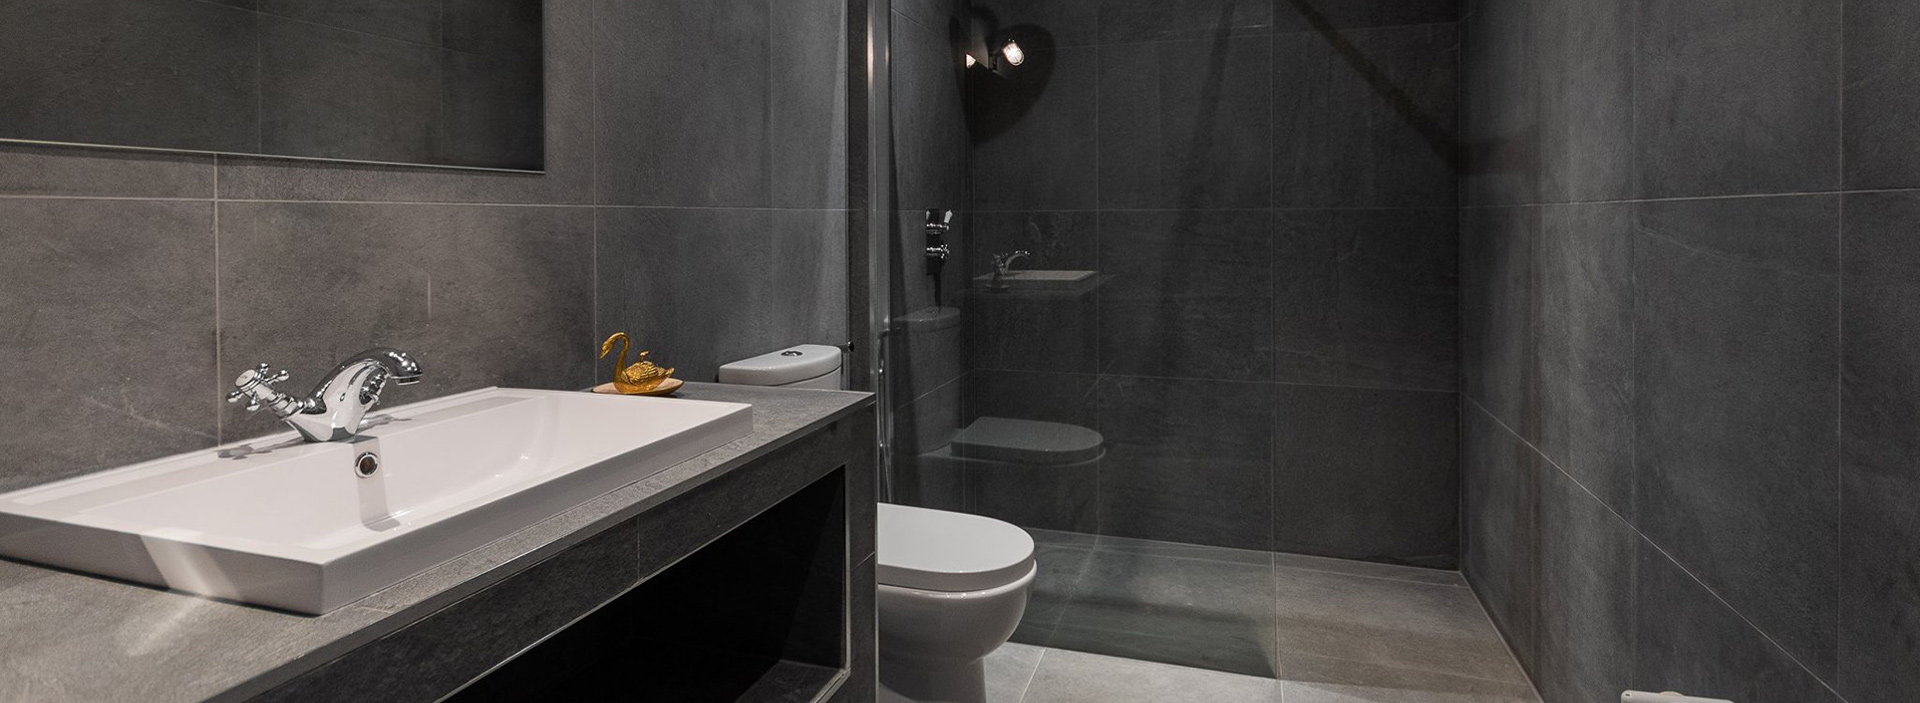 weston bathroom fitter